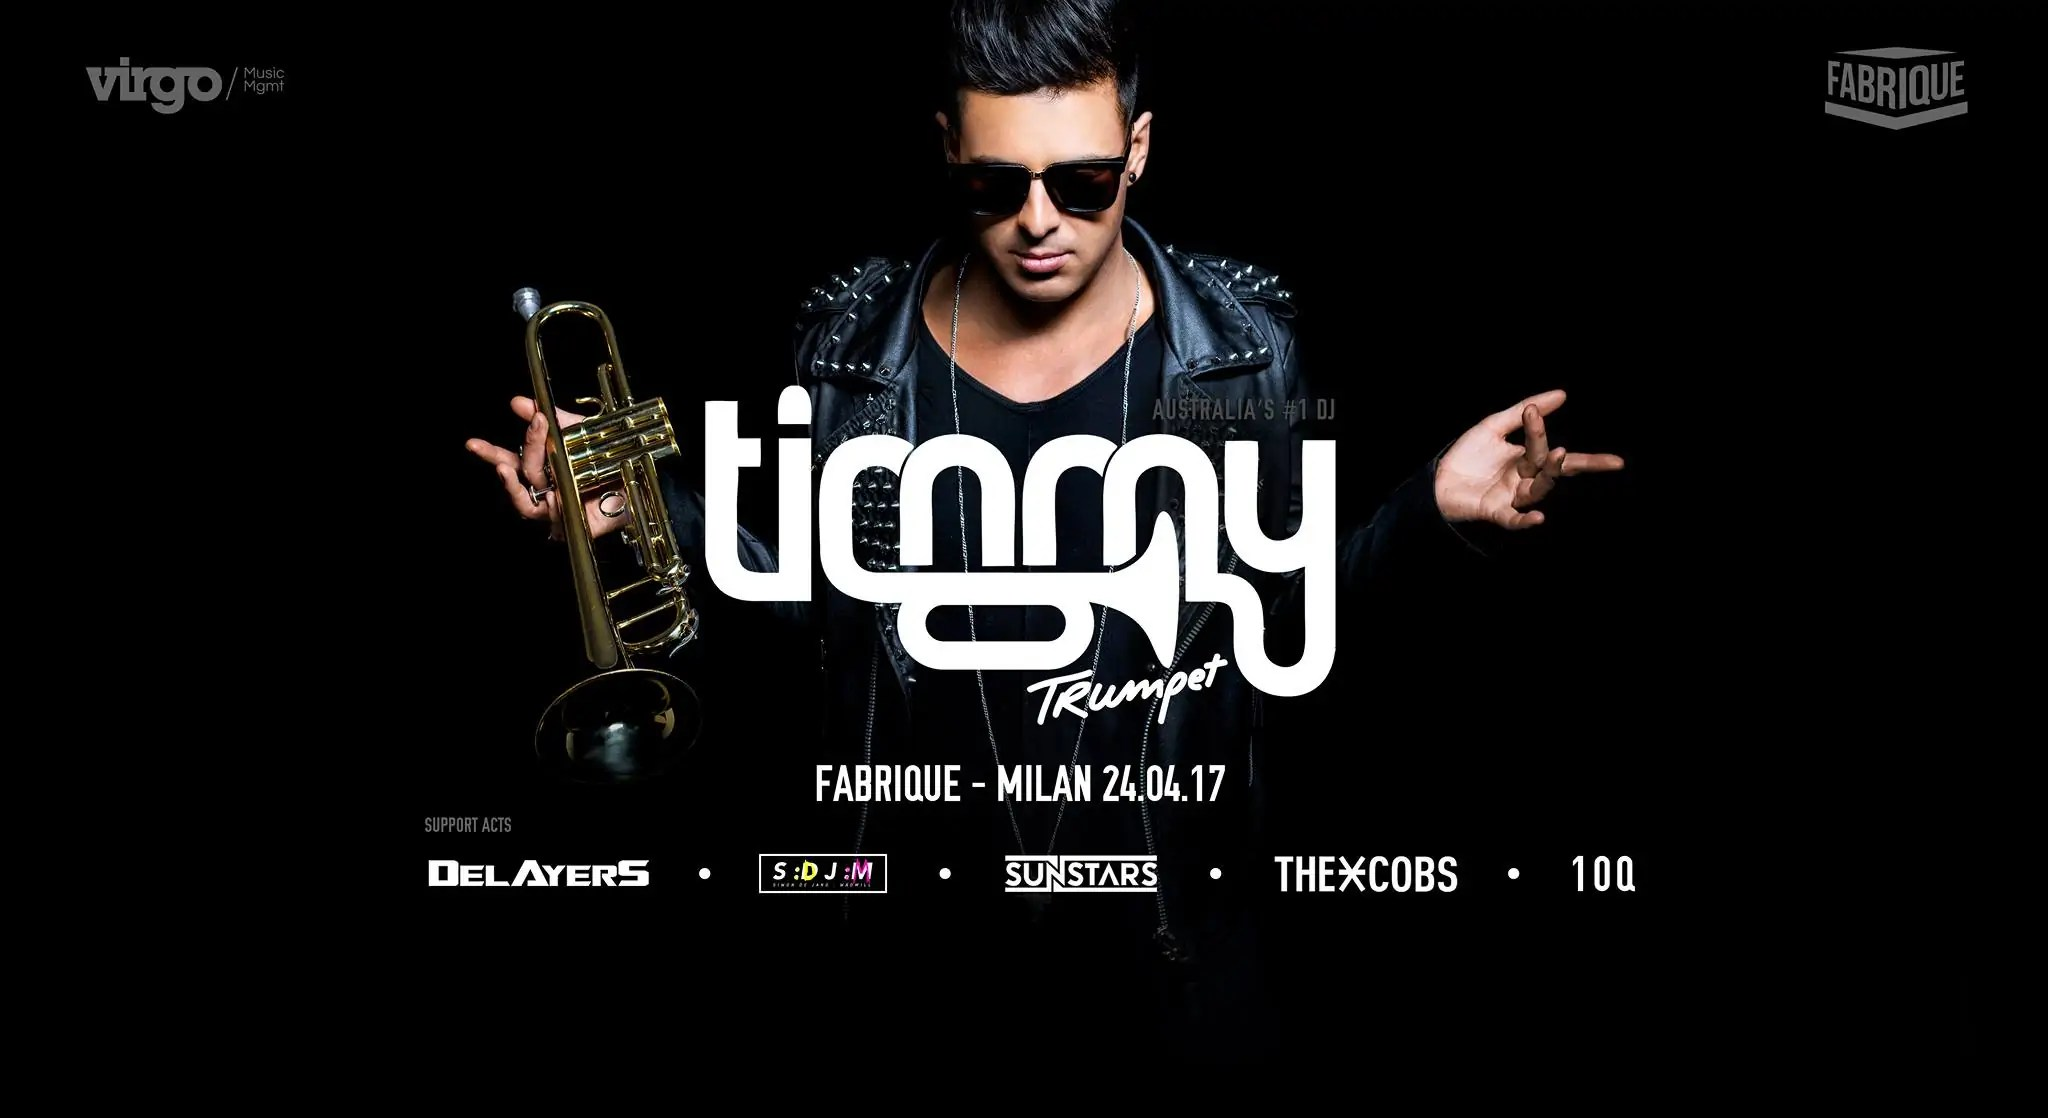 Timmy Trumpet Fabrique Milano 24 04 2017